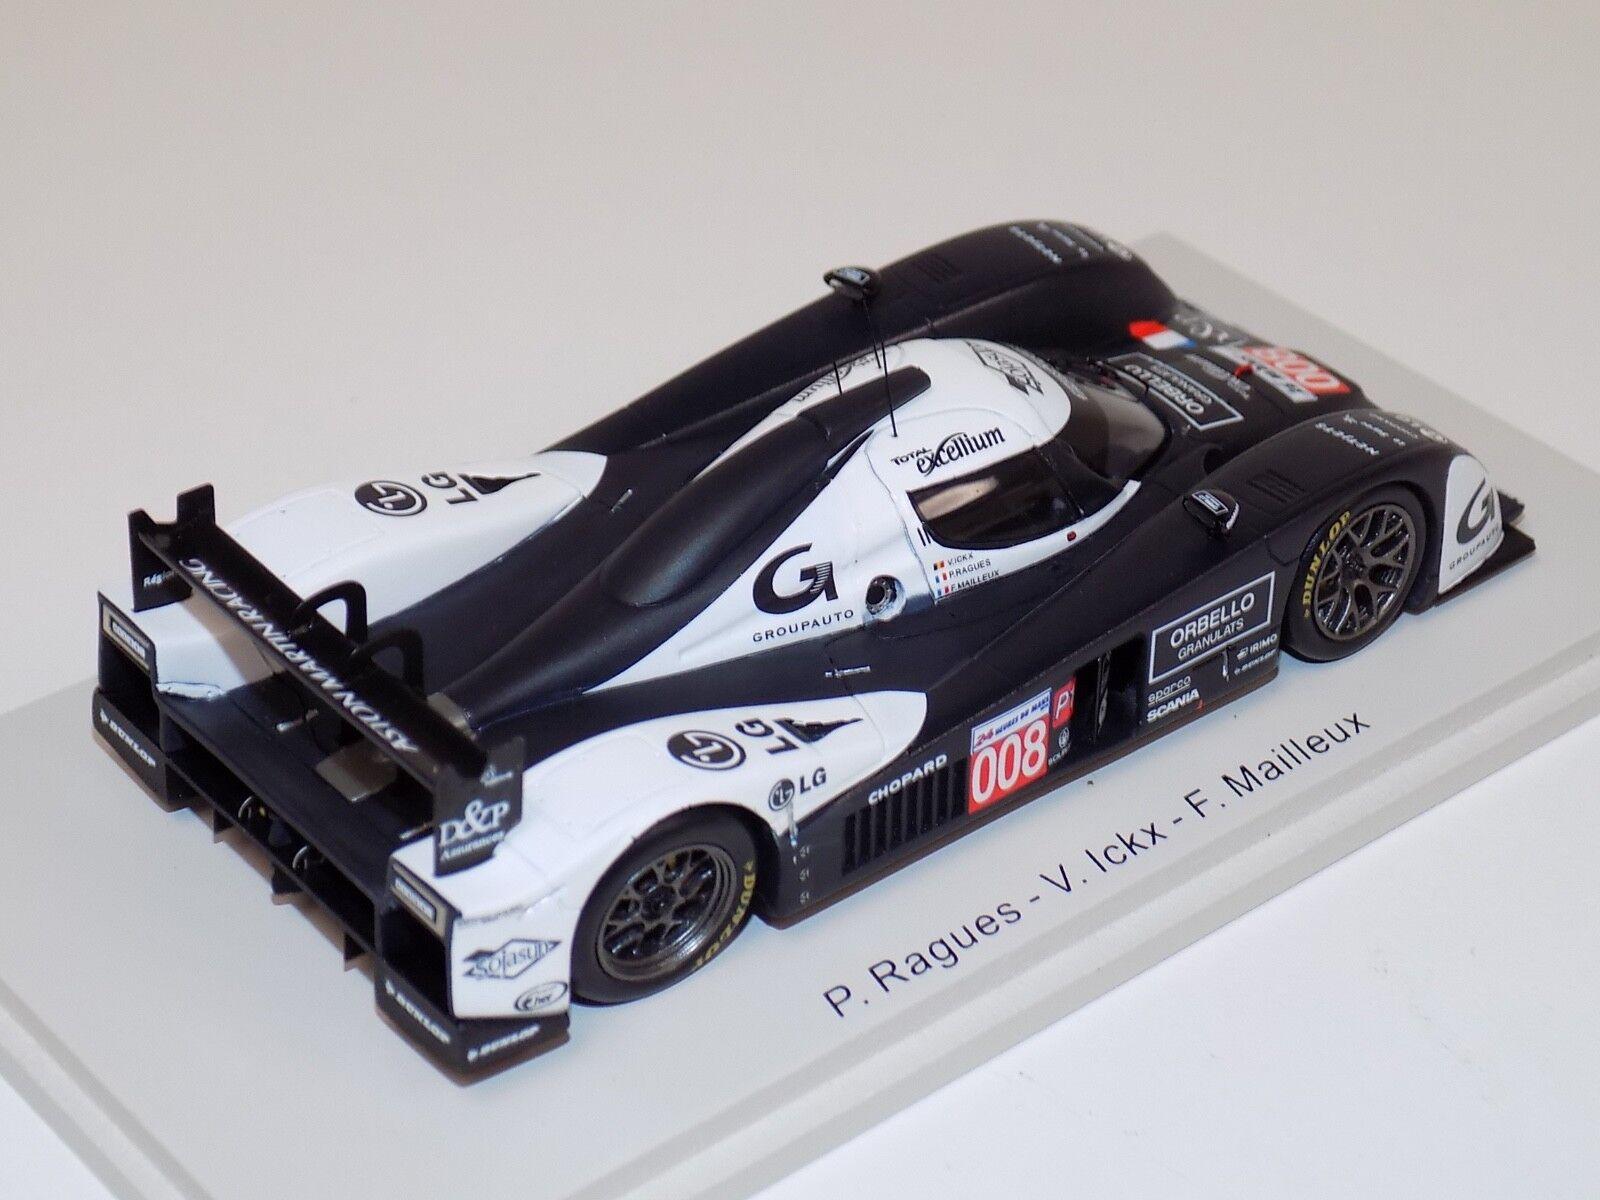 1 43 43 43 Spark Lola Aston Martin Car  H of Le Mans  S2559 facc88